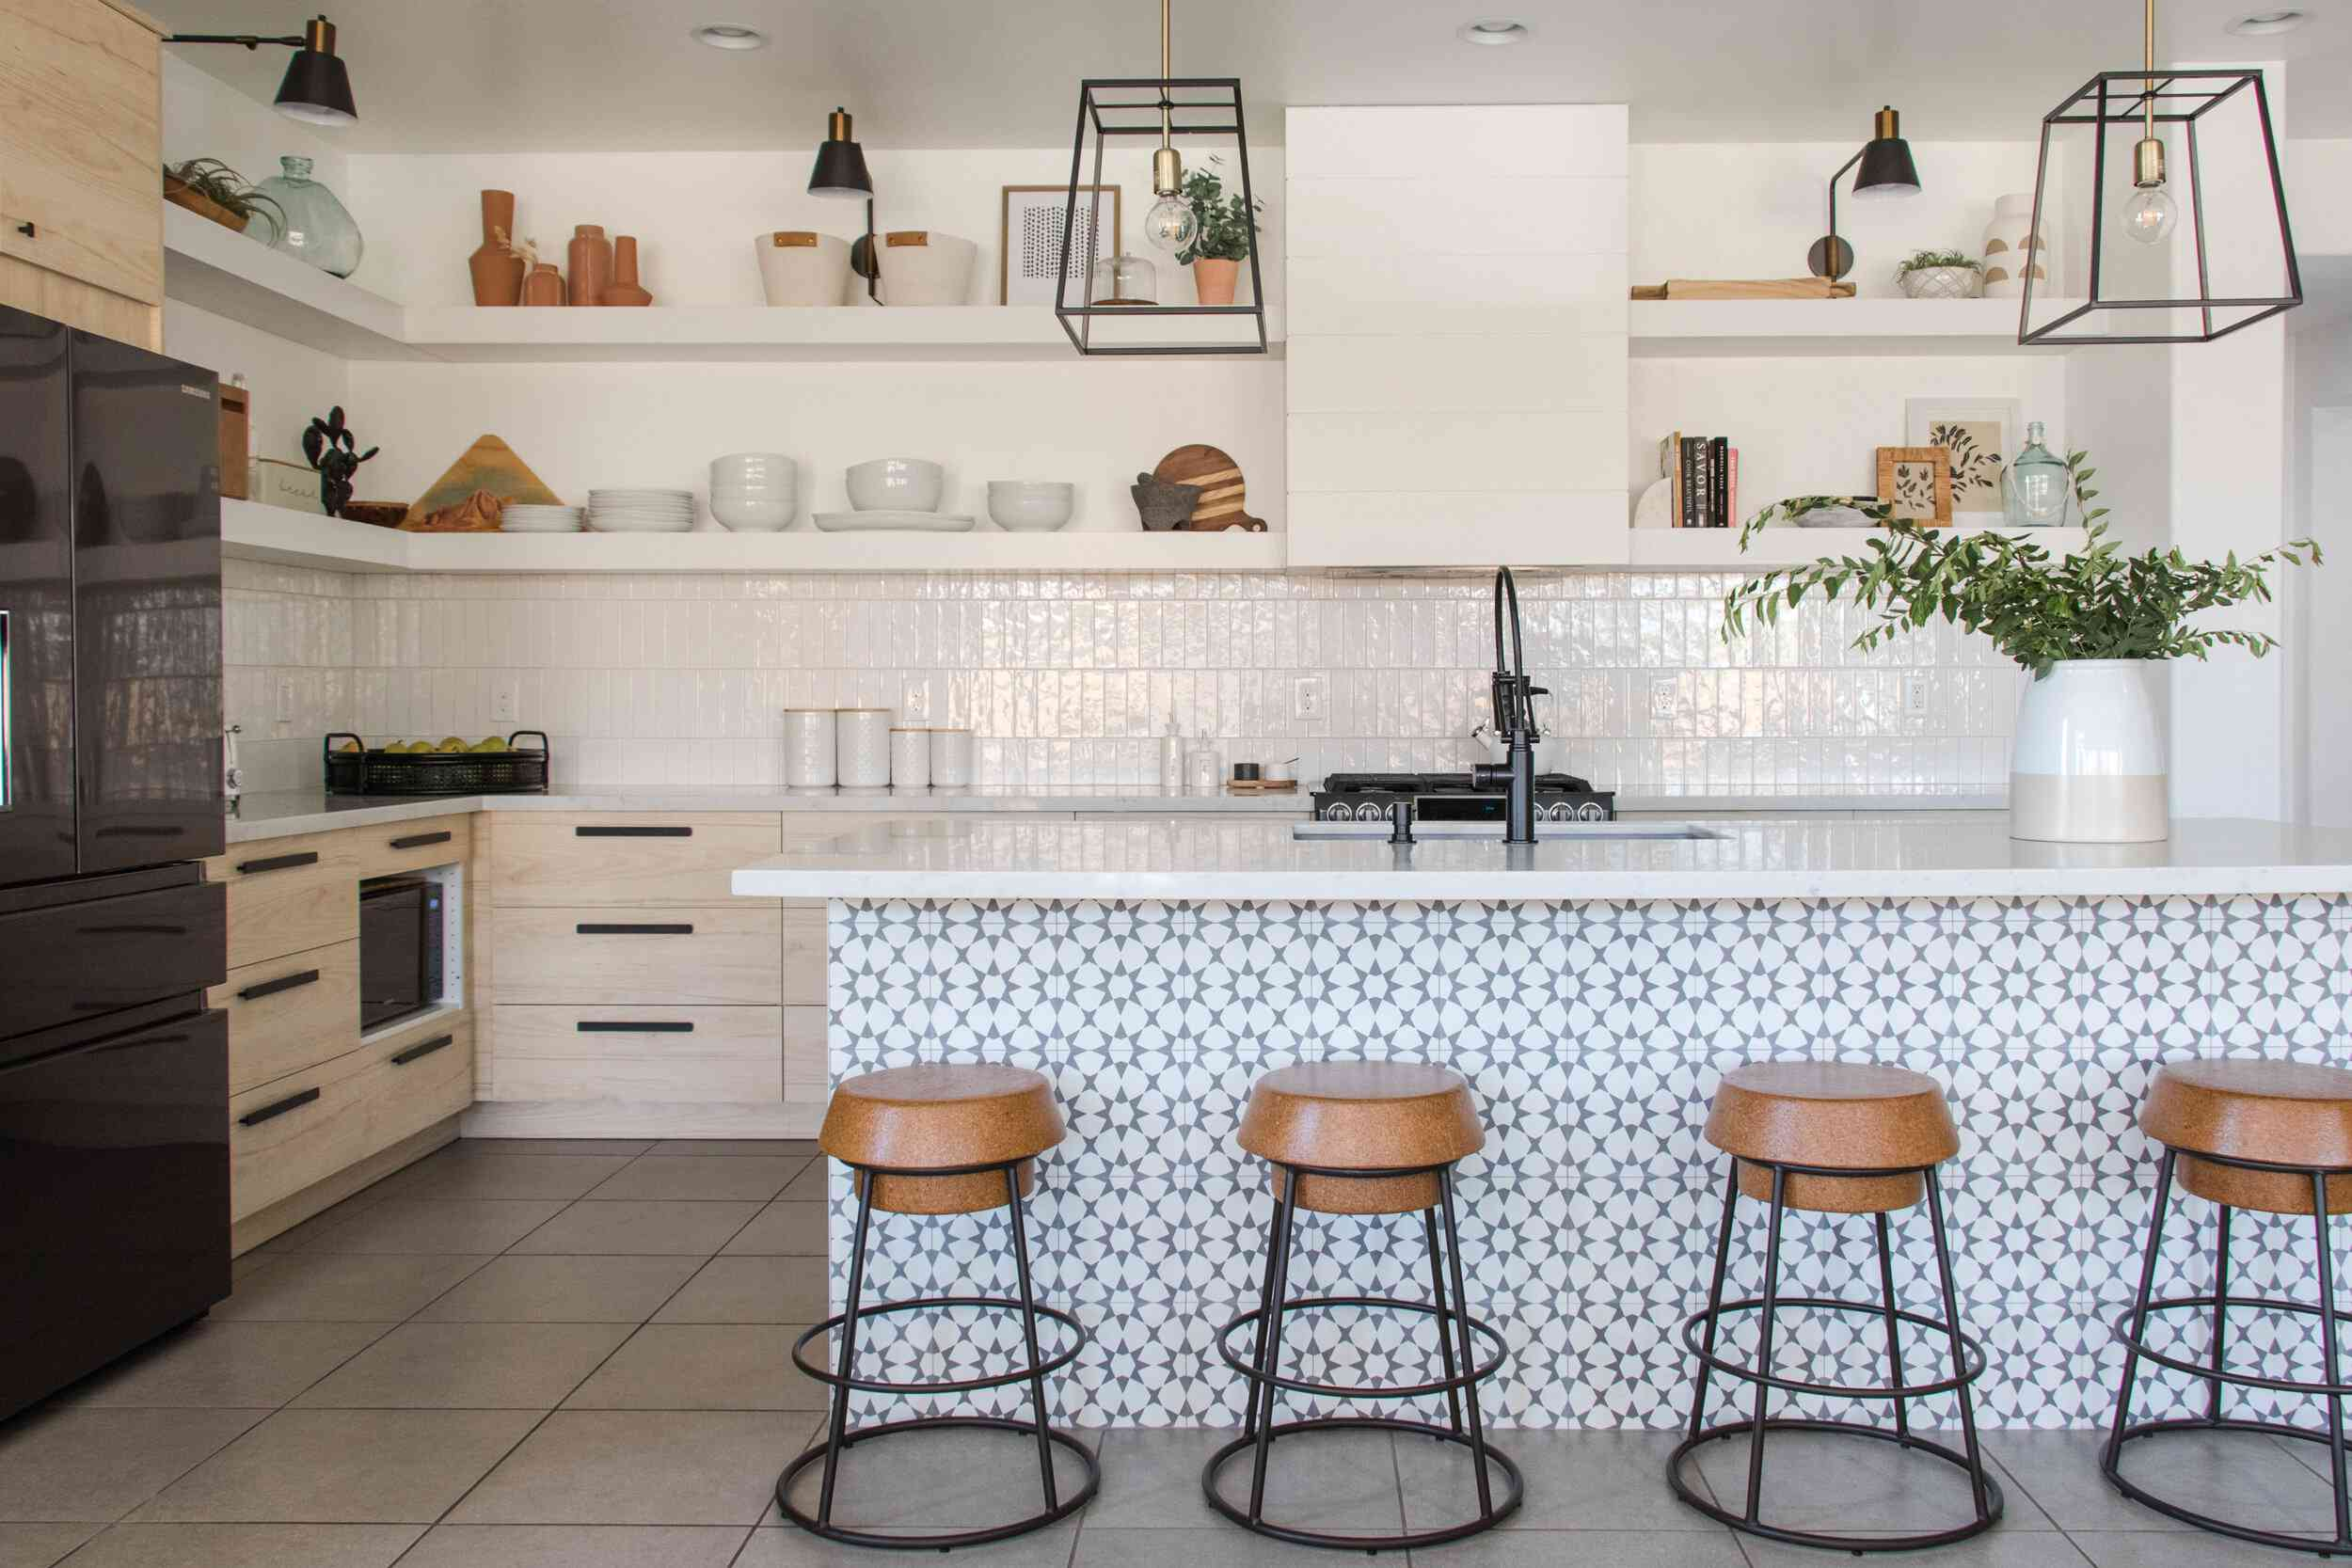 Kitchen with white tile backsplash